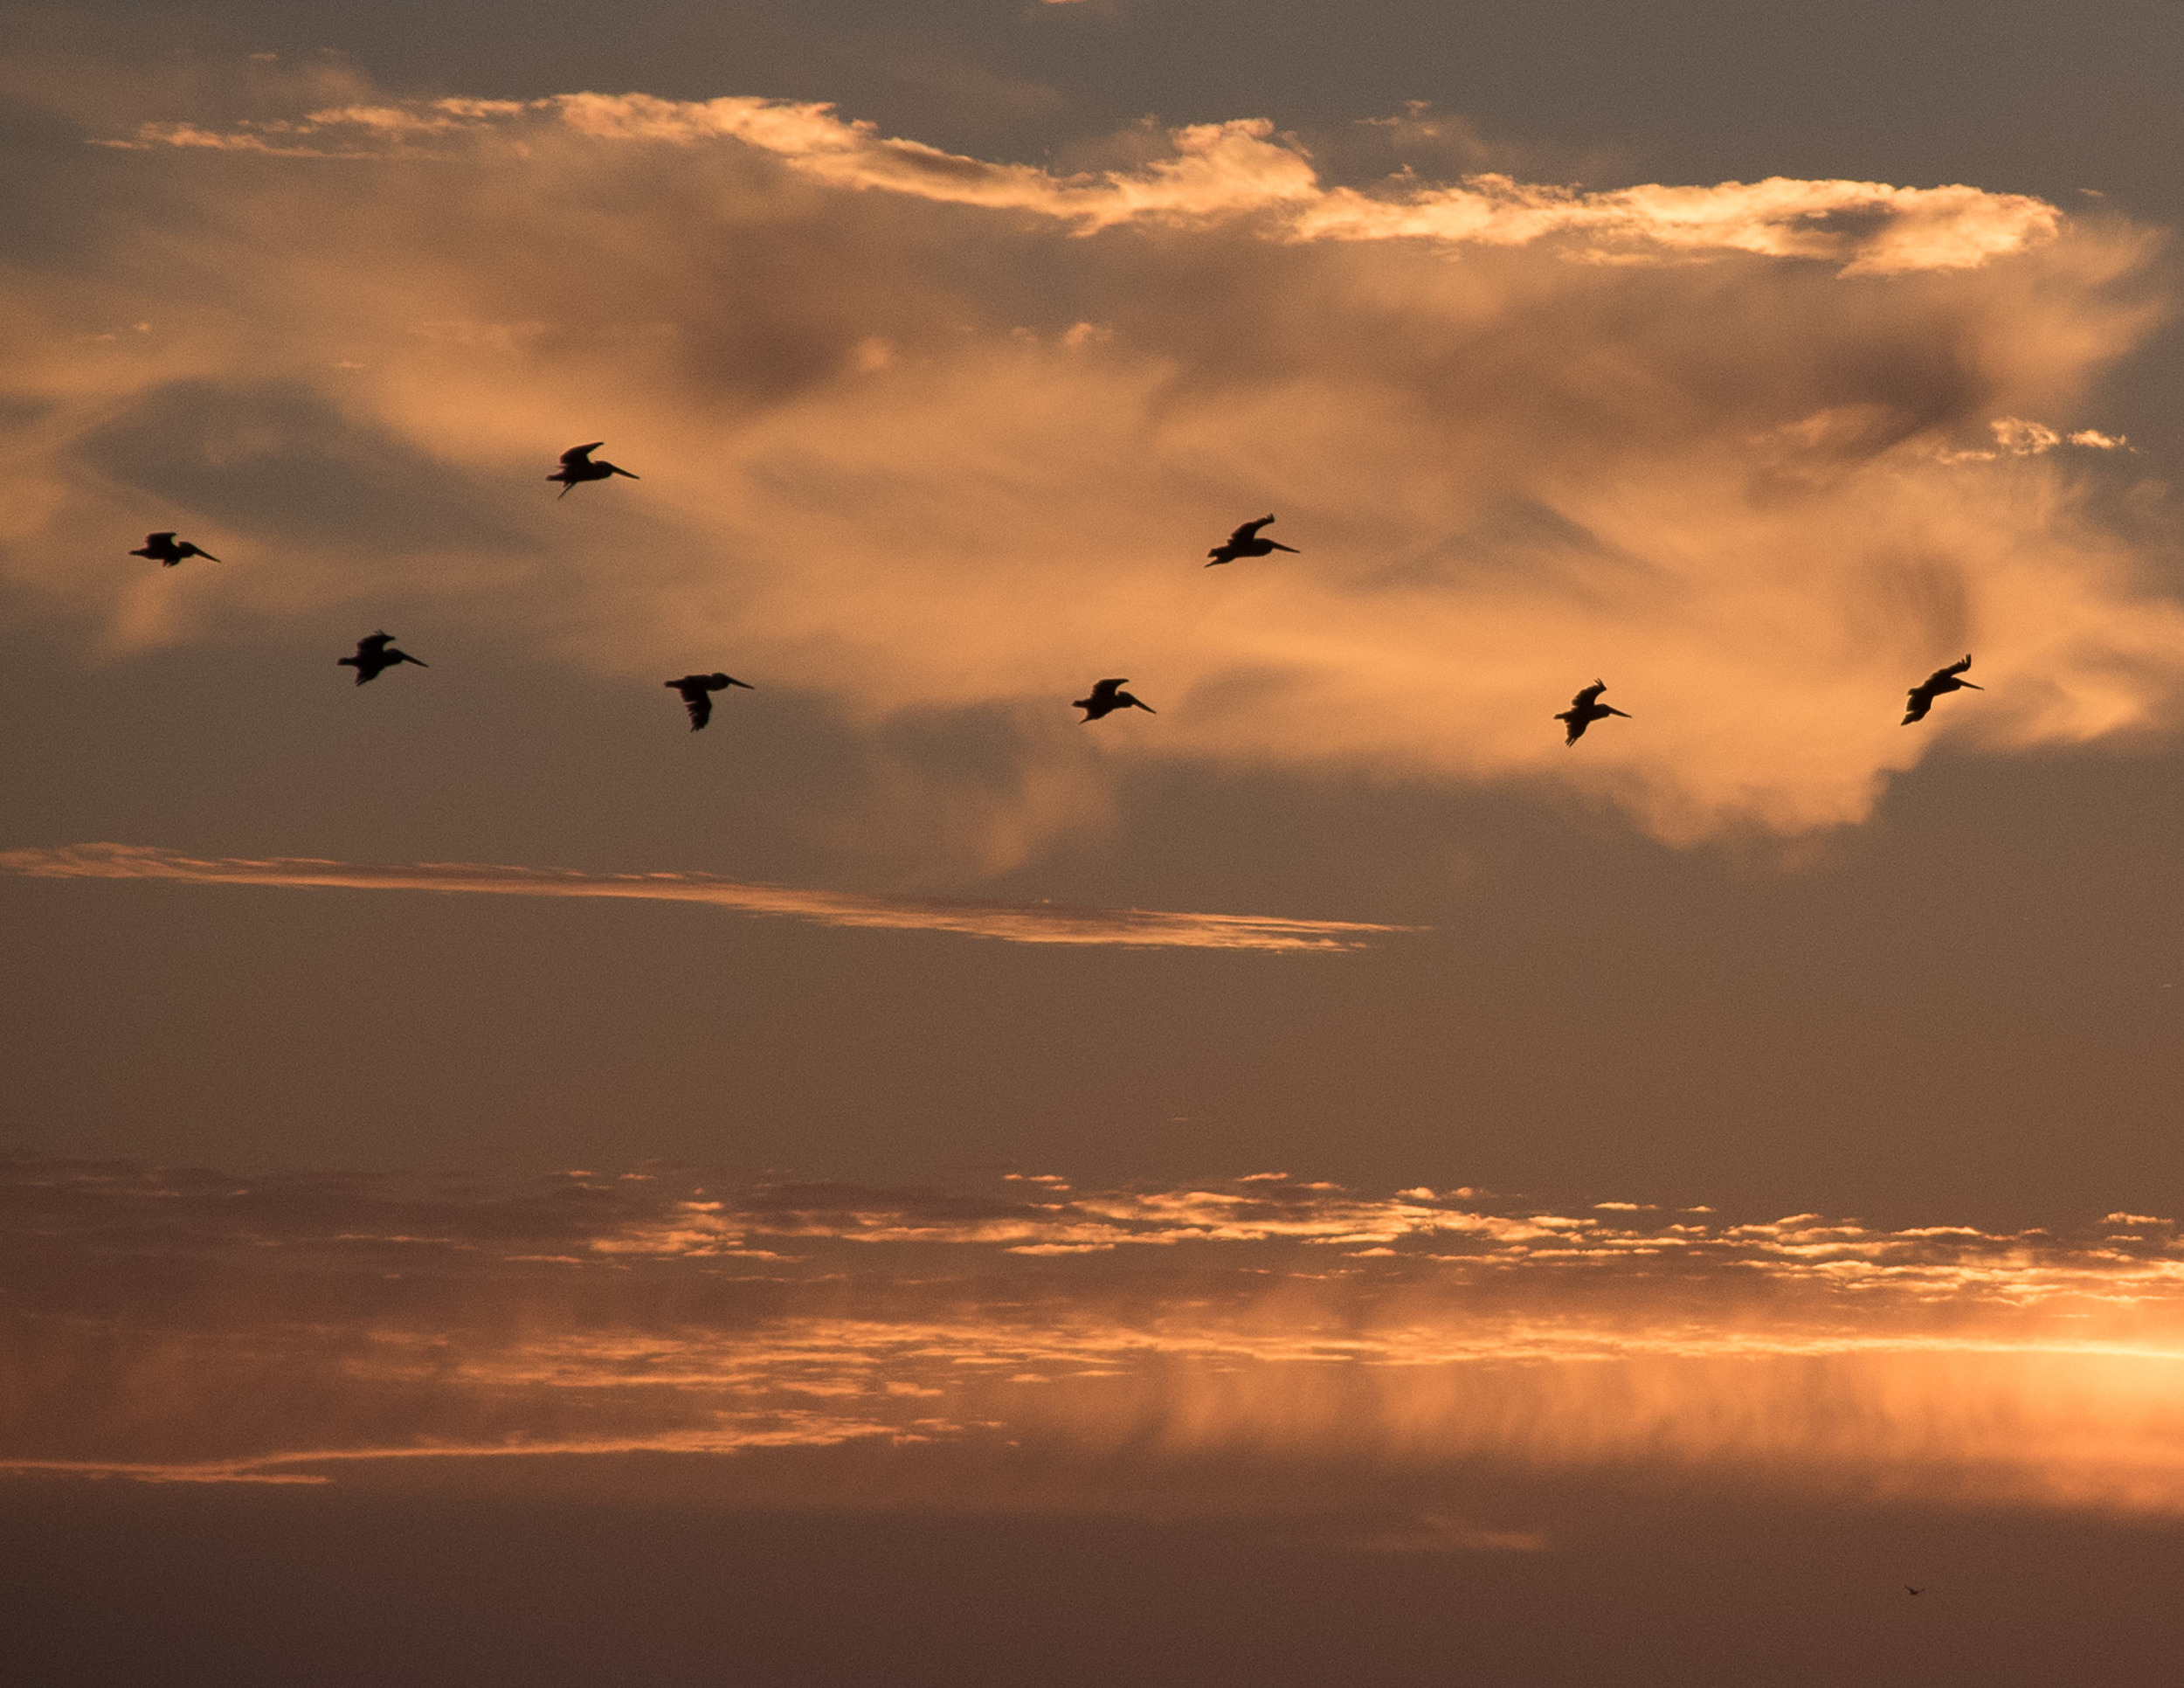 151214 SF Sunset Pelican 2  85x11-0332.jpg